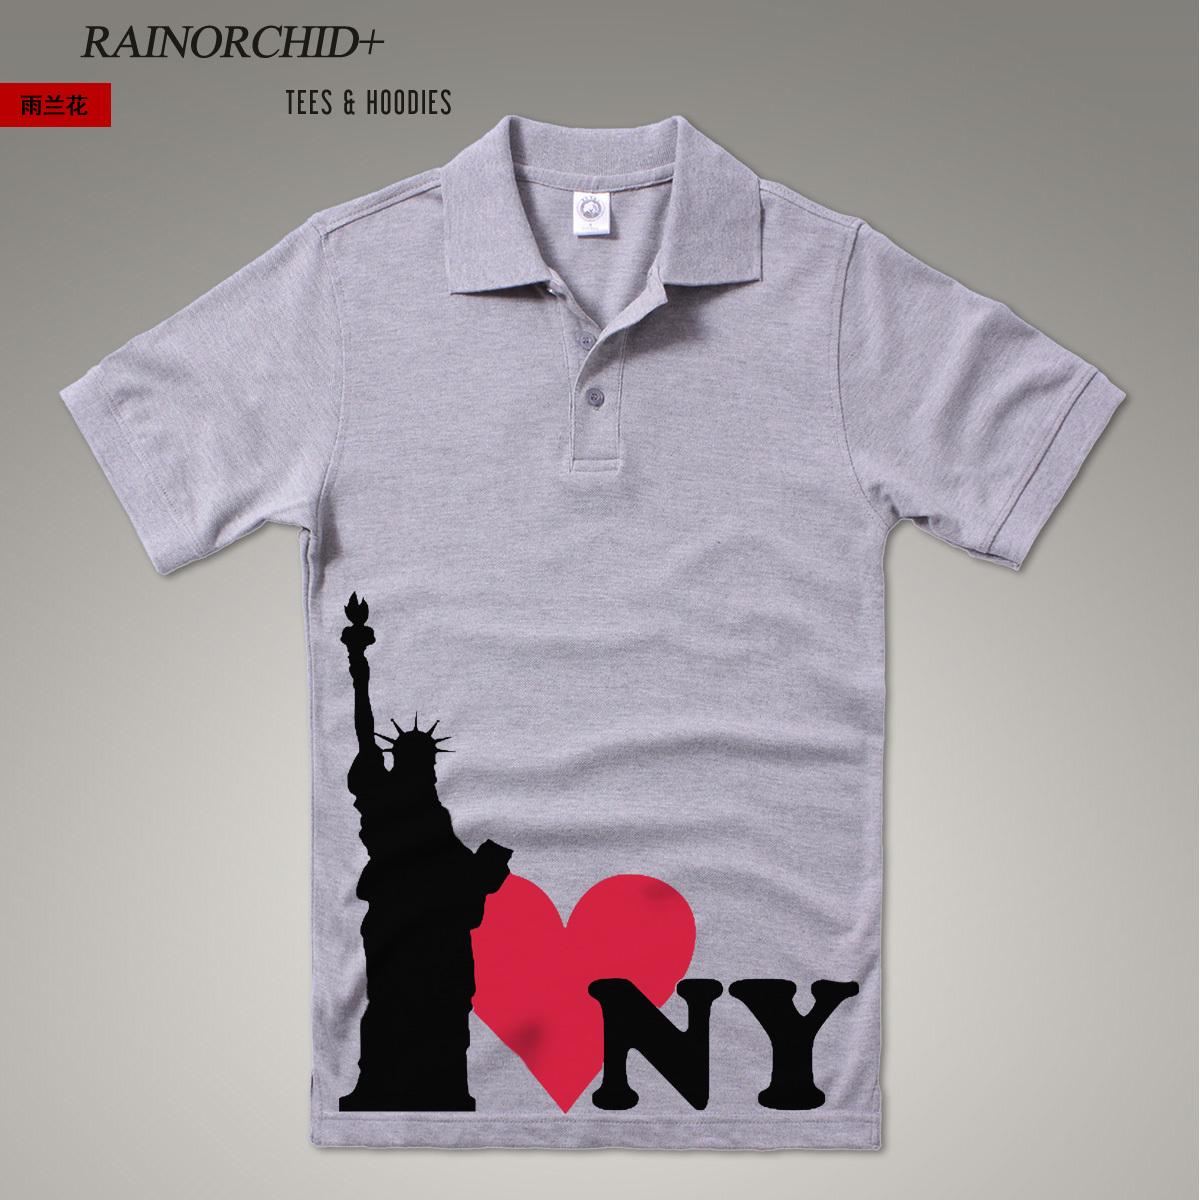 我?9???iny???,?i?_ro【i love ny】我爱纽约自由女神像立领★polo衫短袖